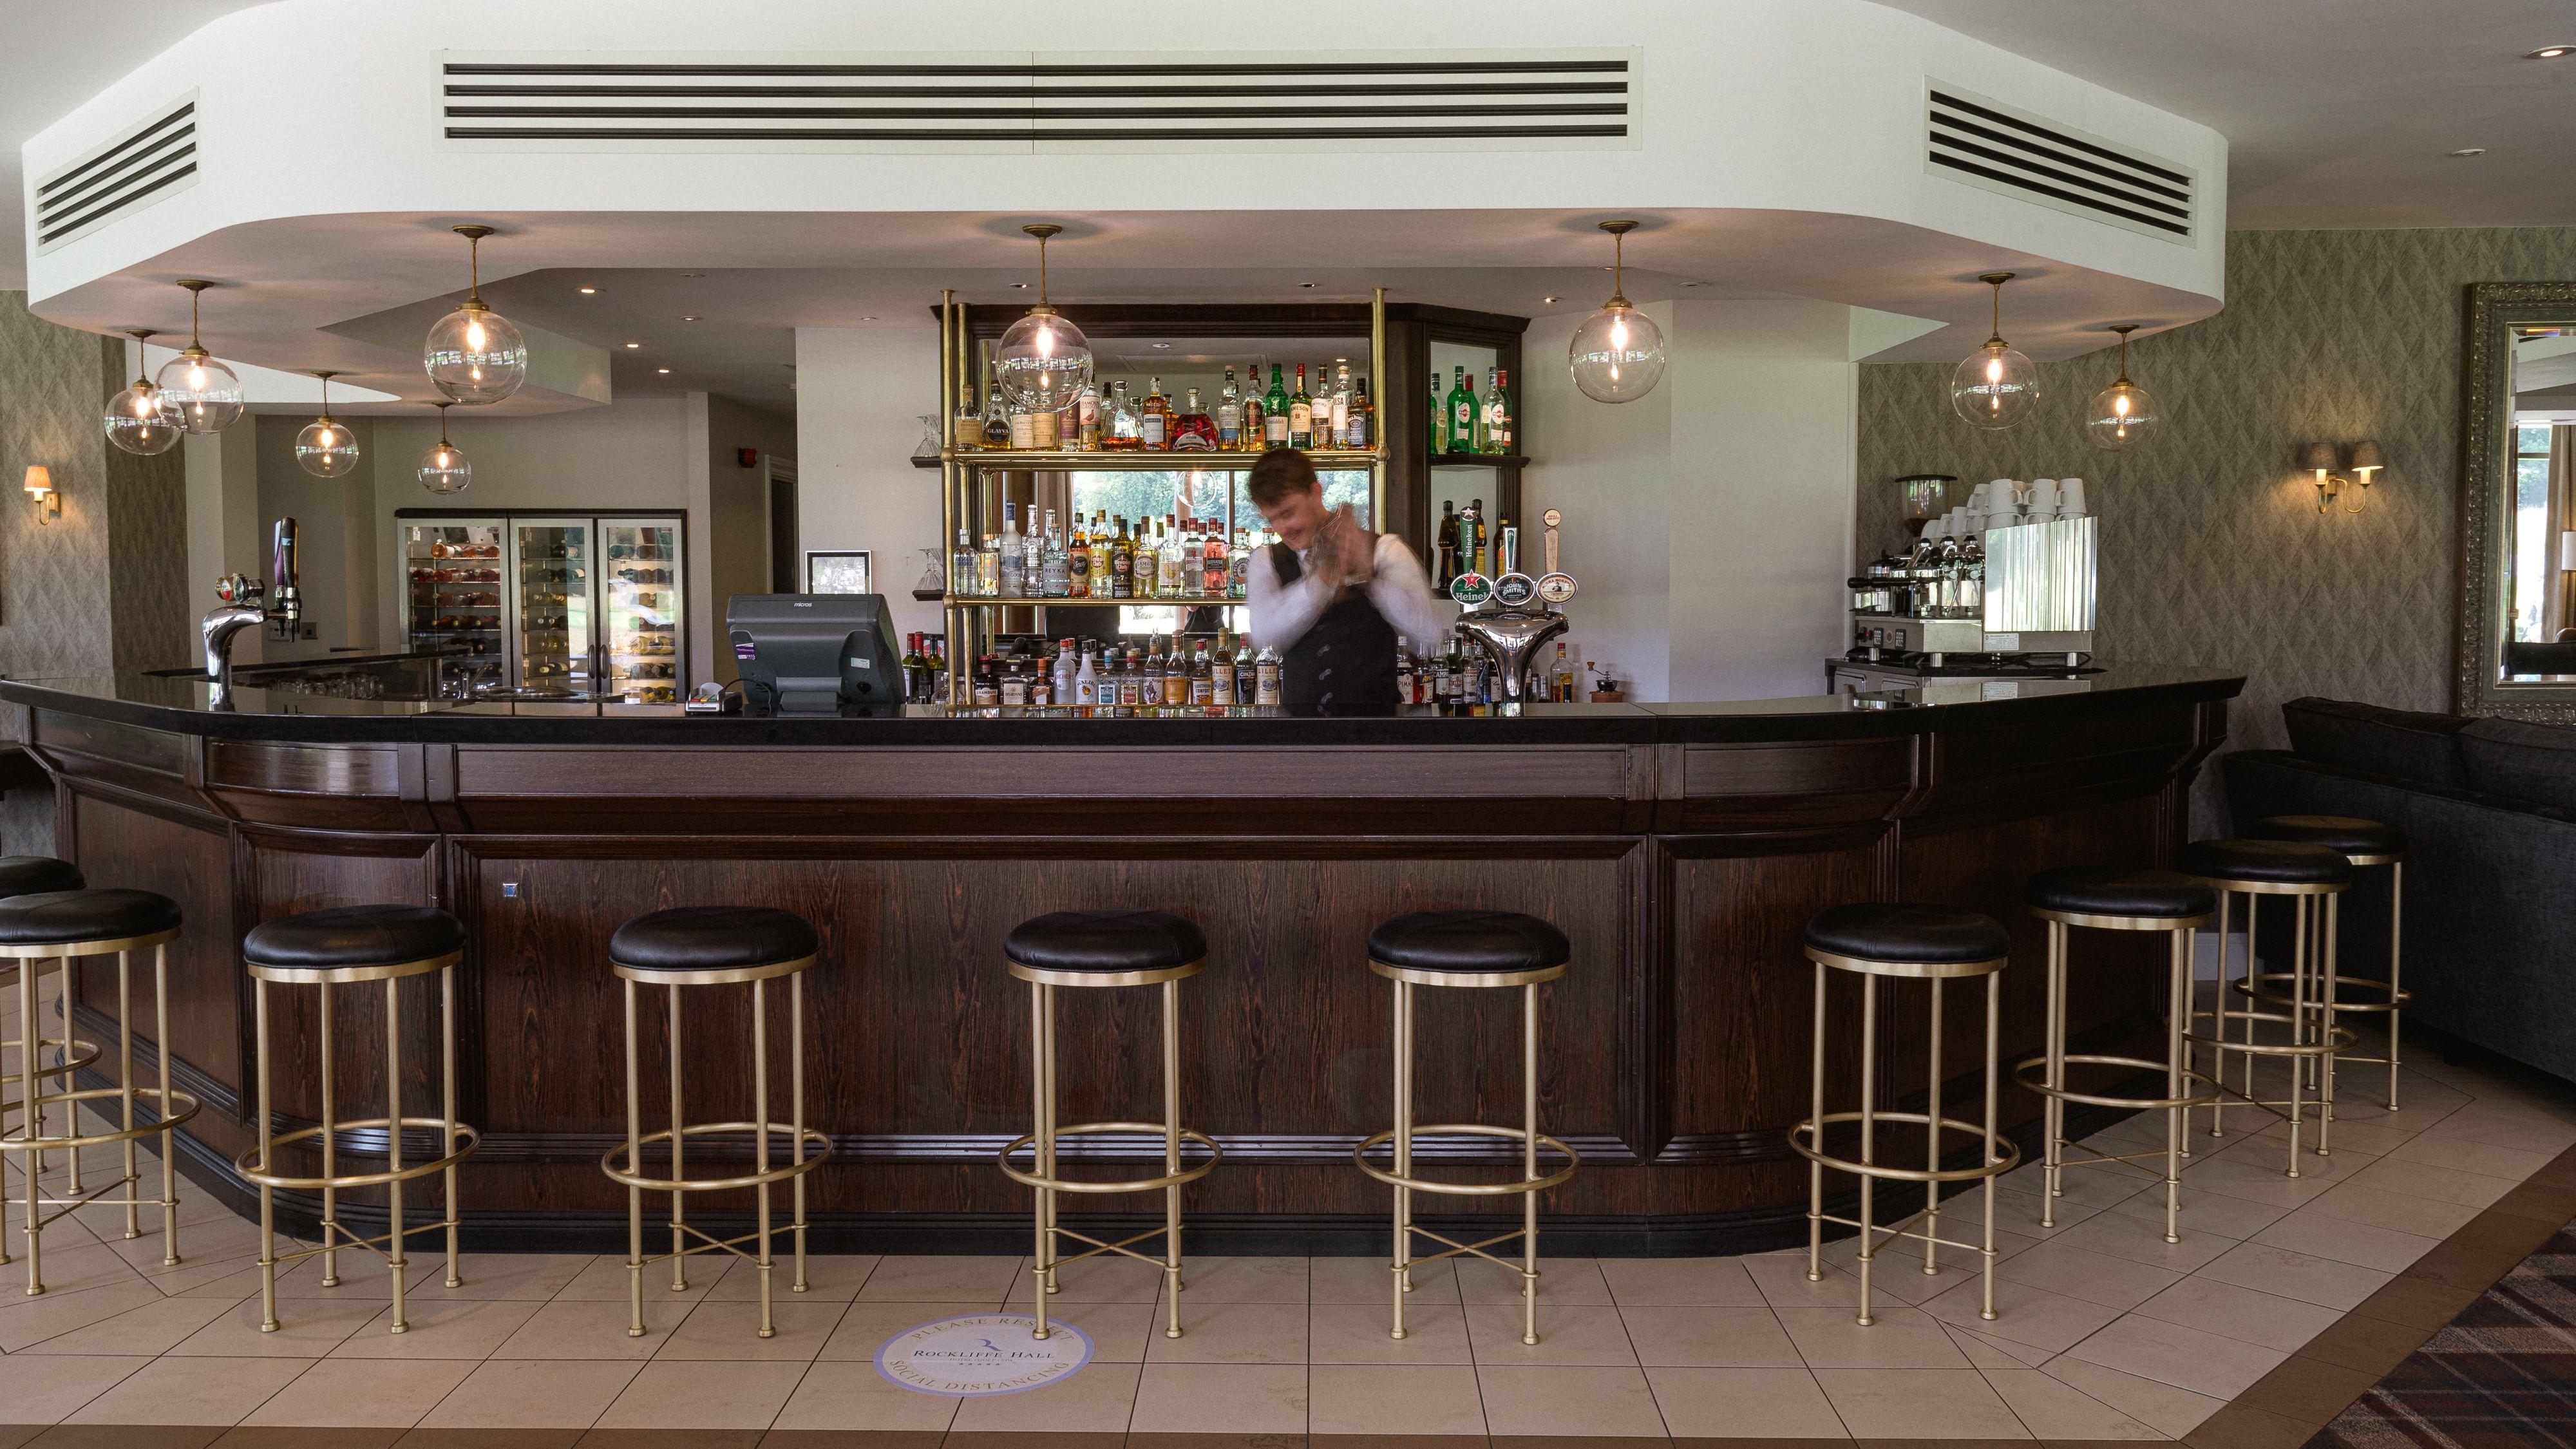 Home House Member Club In London Bars For Home Zaha Hadid London House